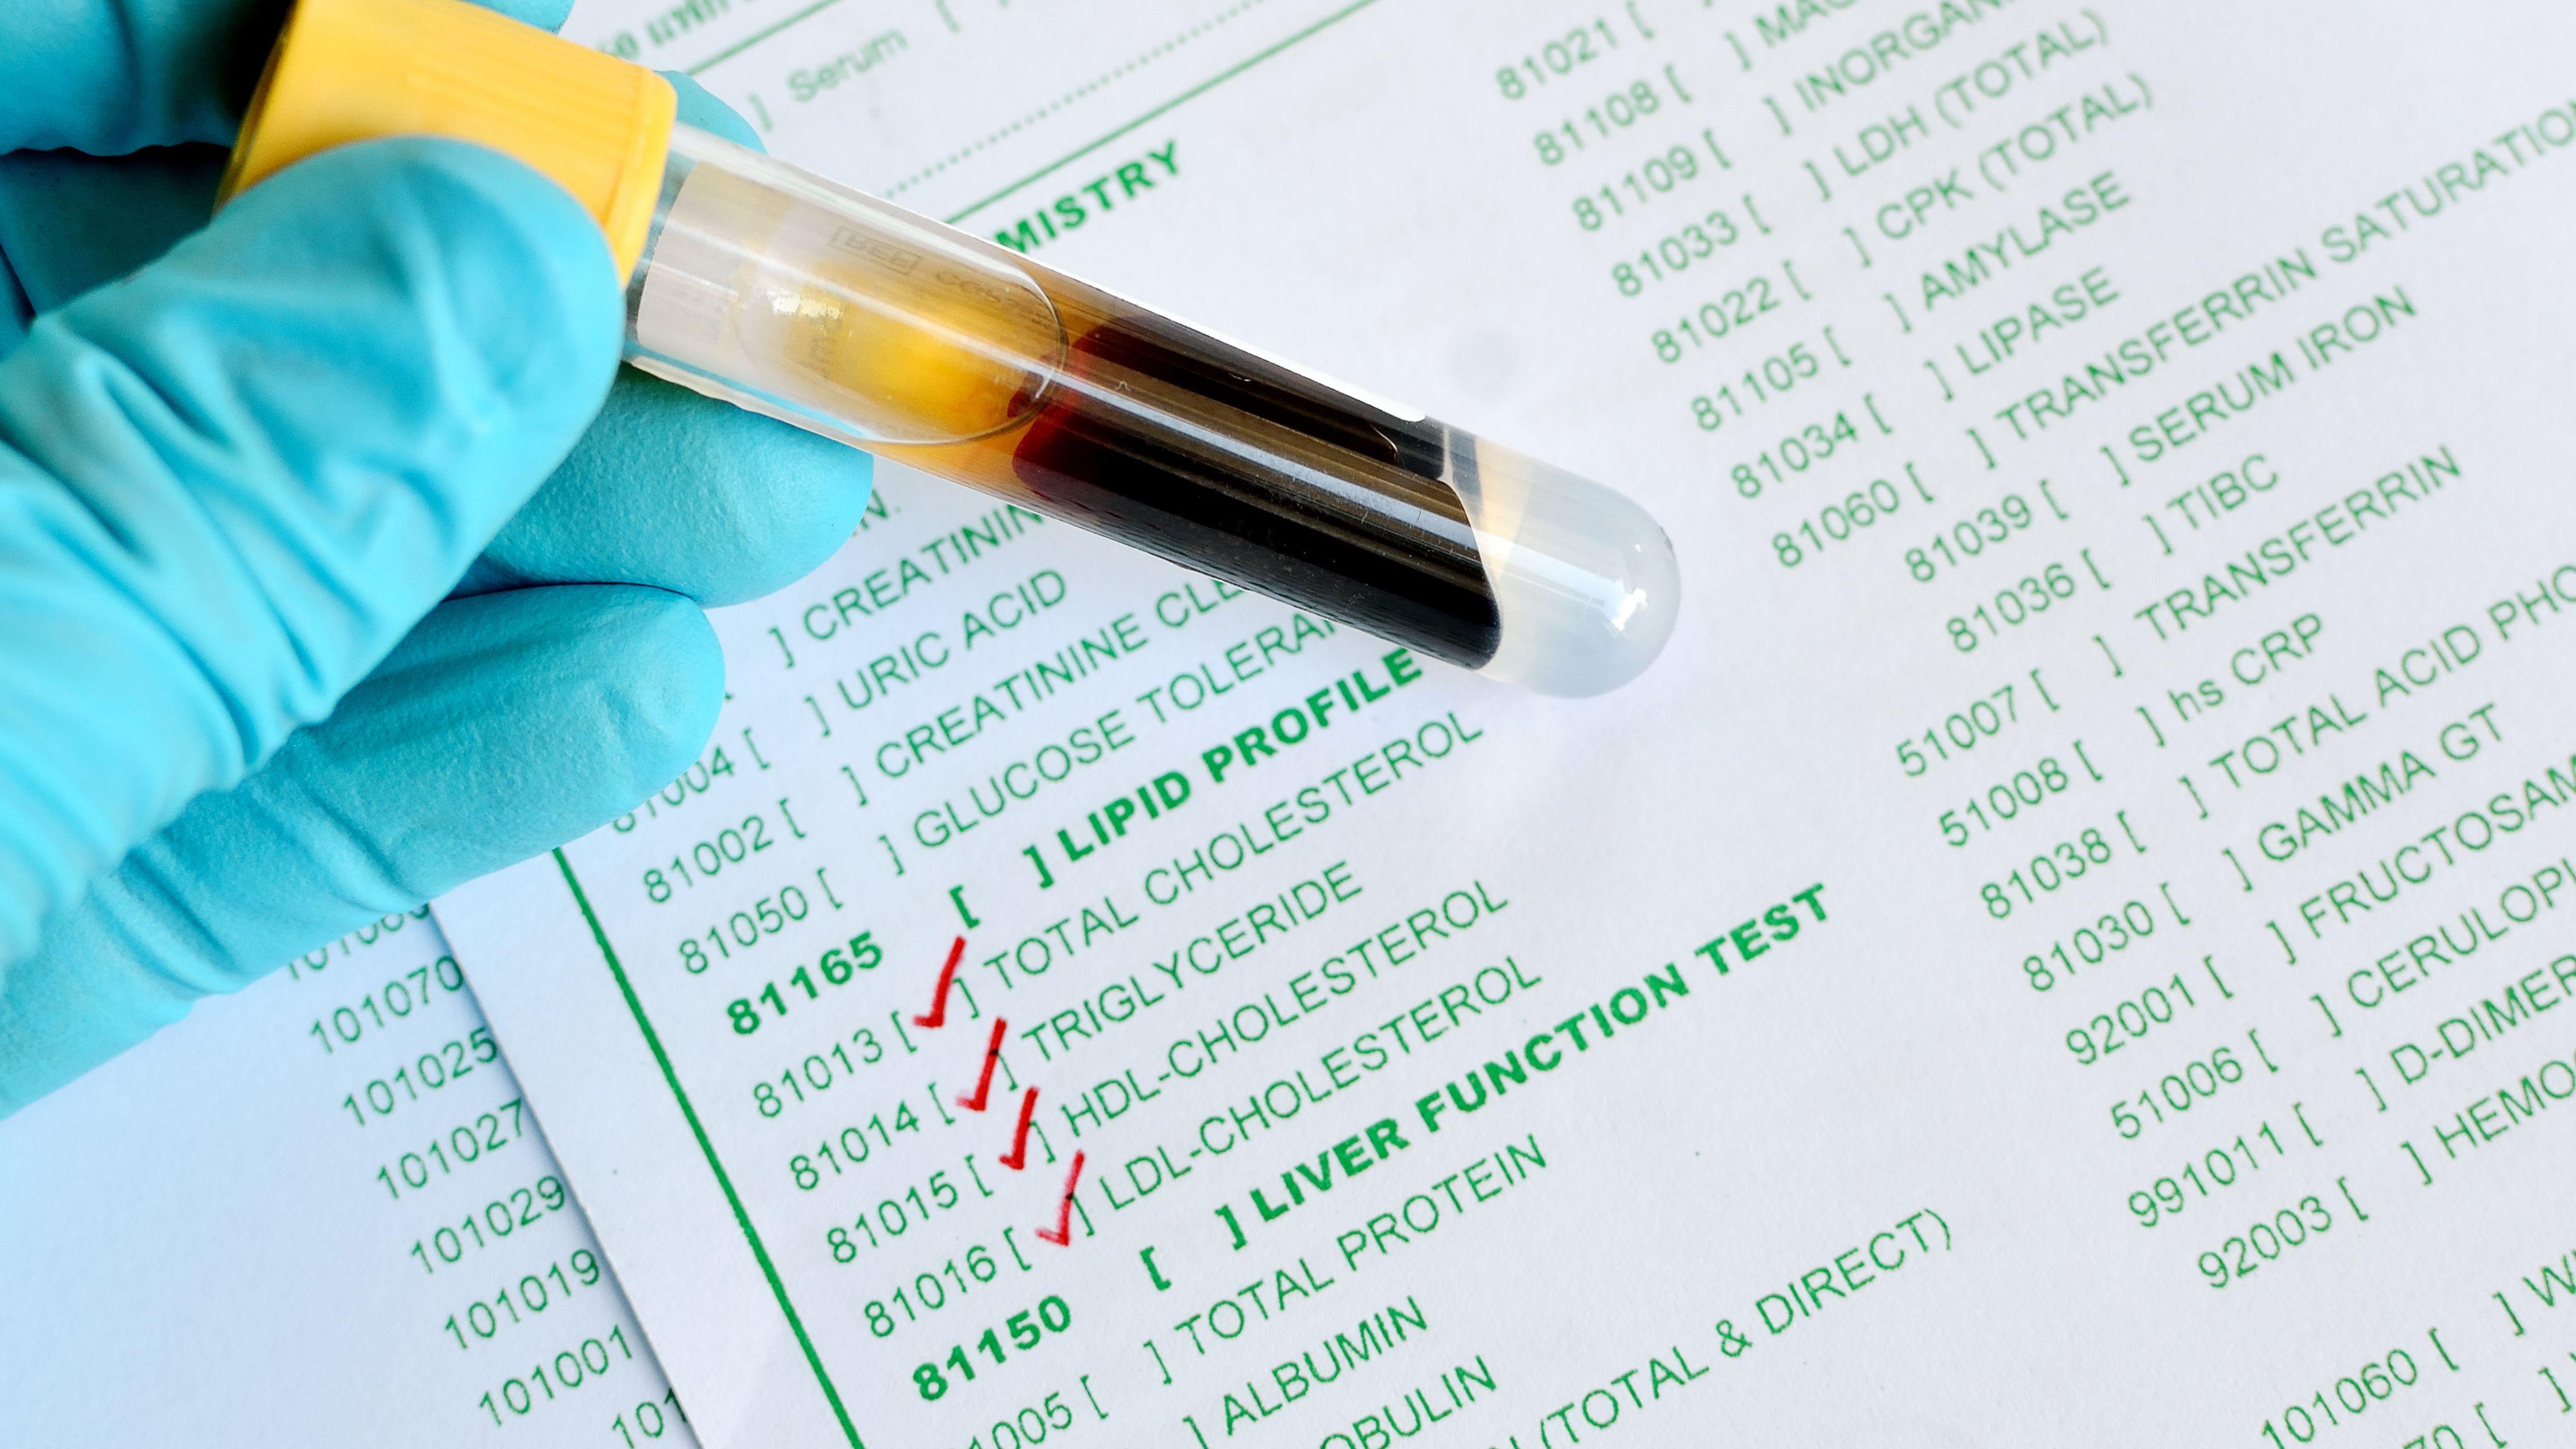 Vascepa (Icosapent Ethyl) for High Cholesterol